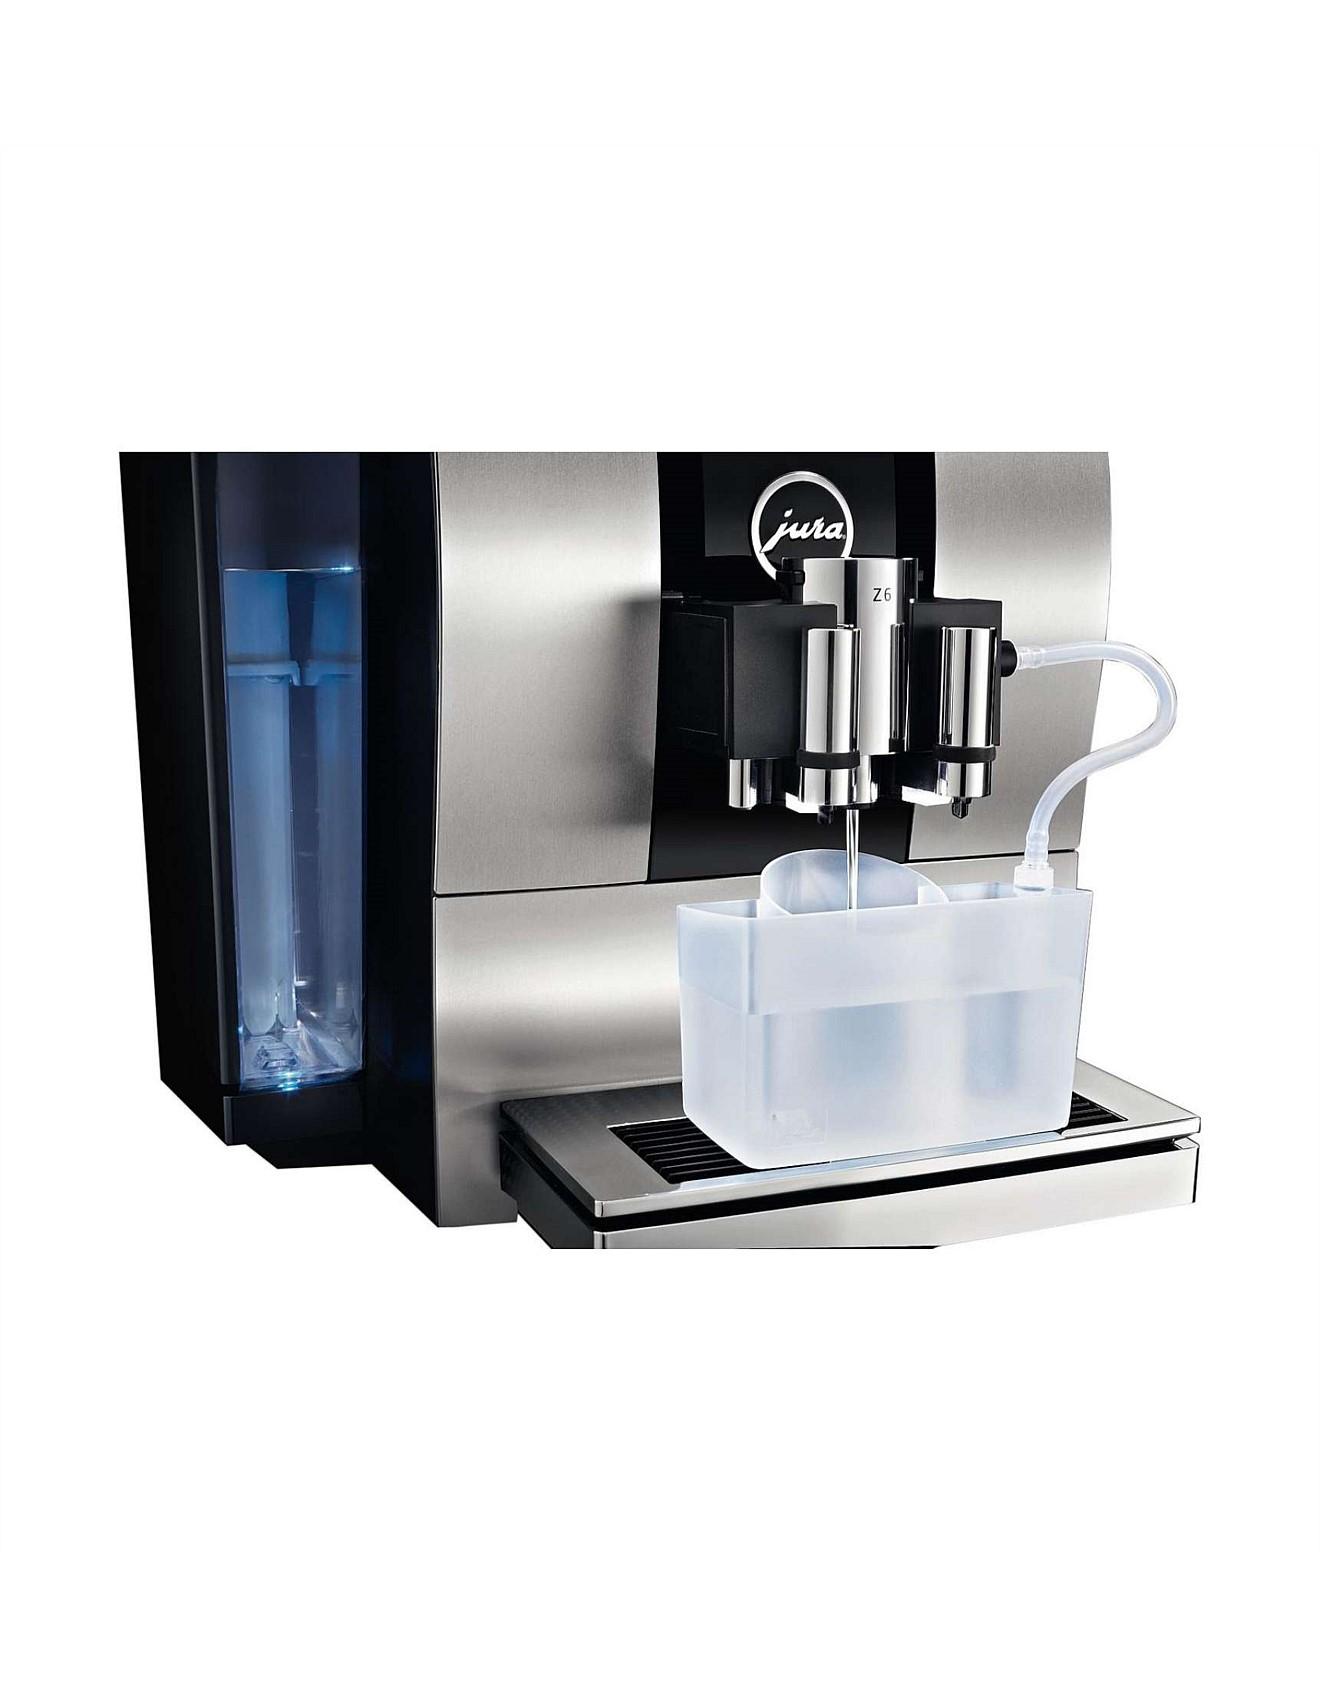 Jura | Buy Jura Coffee Machines Online | David Jones - Z6 ...